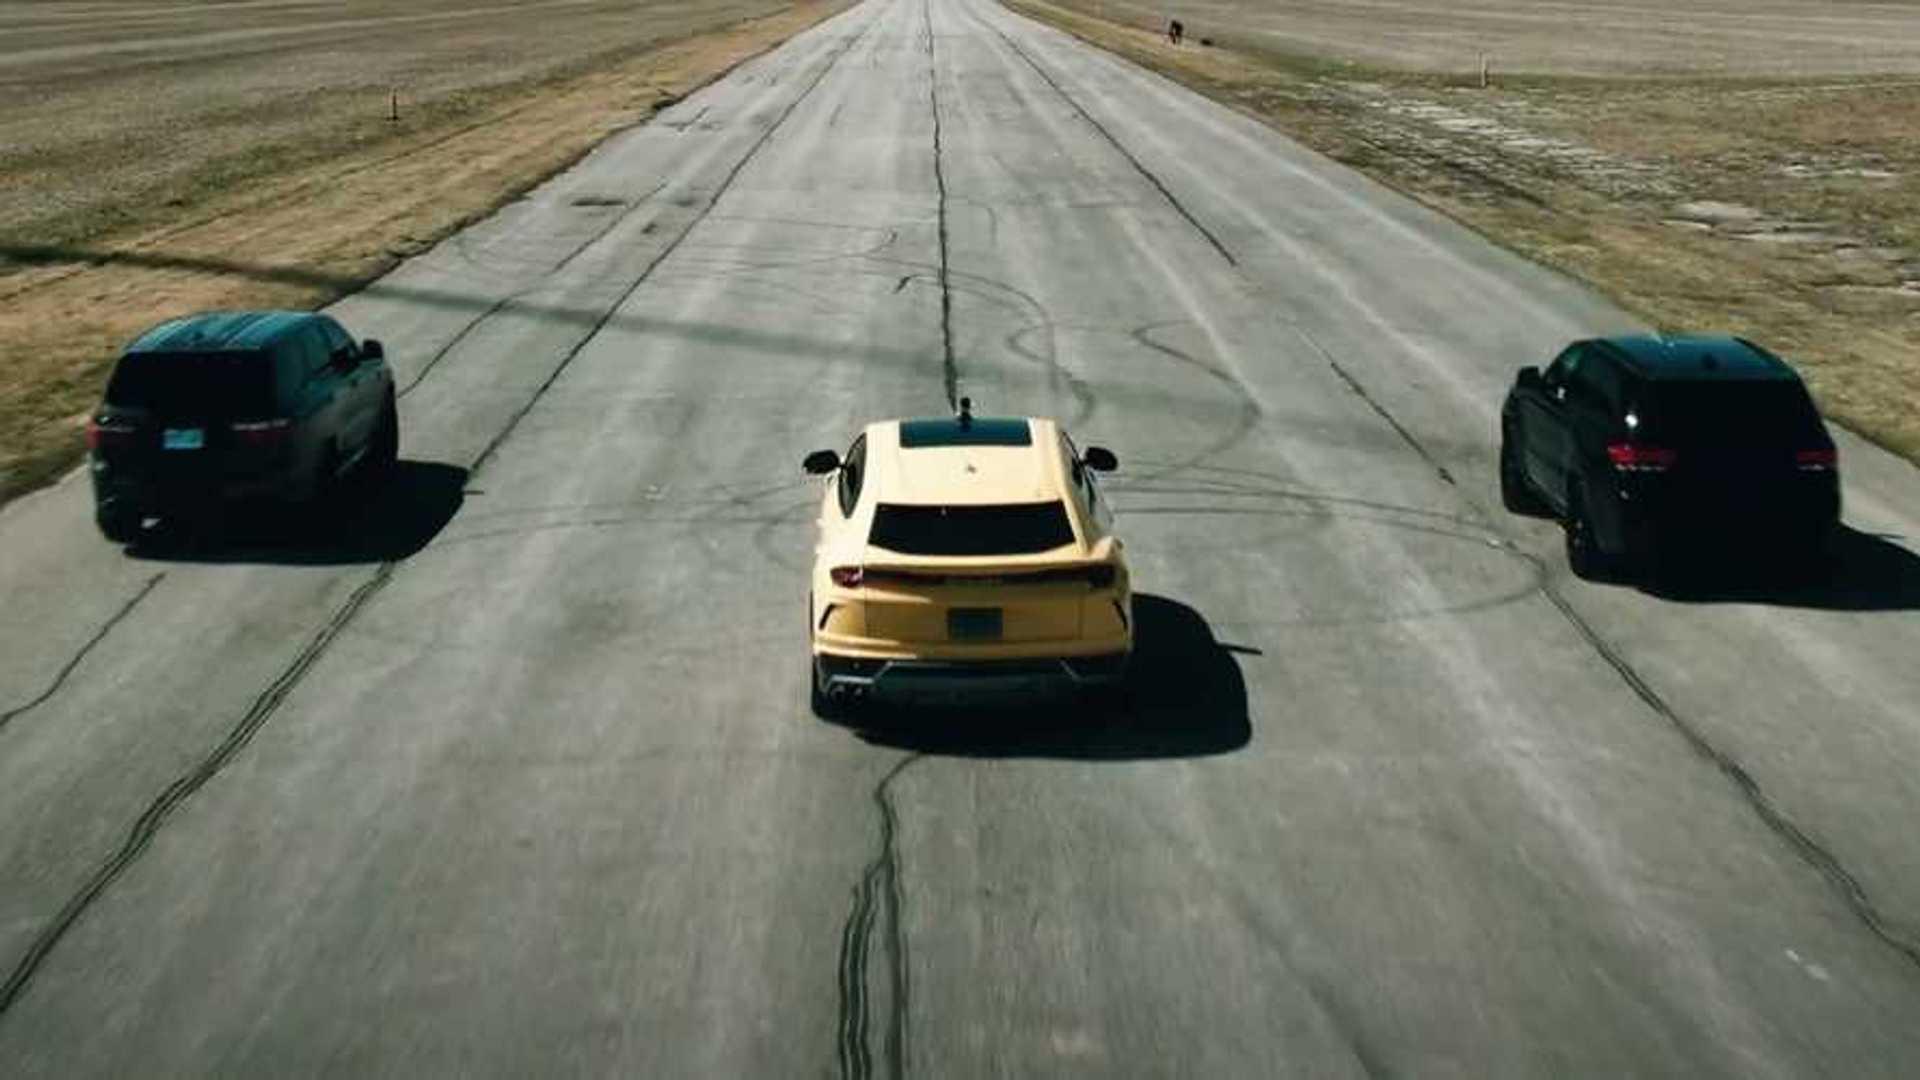 Durango Hellcat Drag Races Jeep Trackhawk, Urus In Potent SUV Showdown